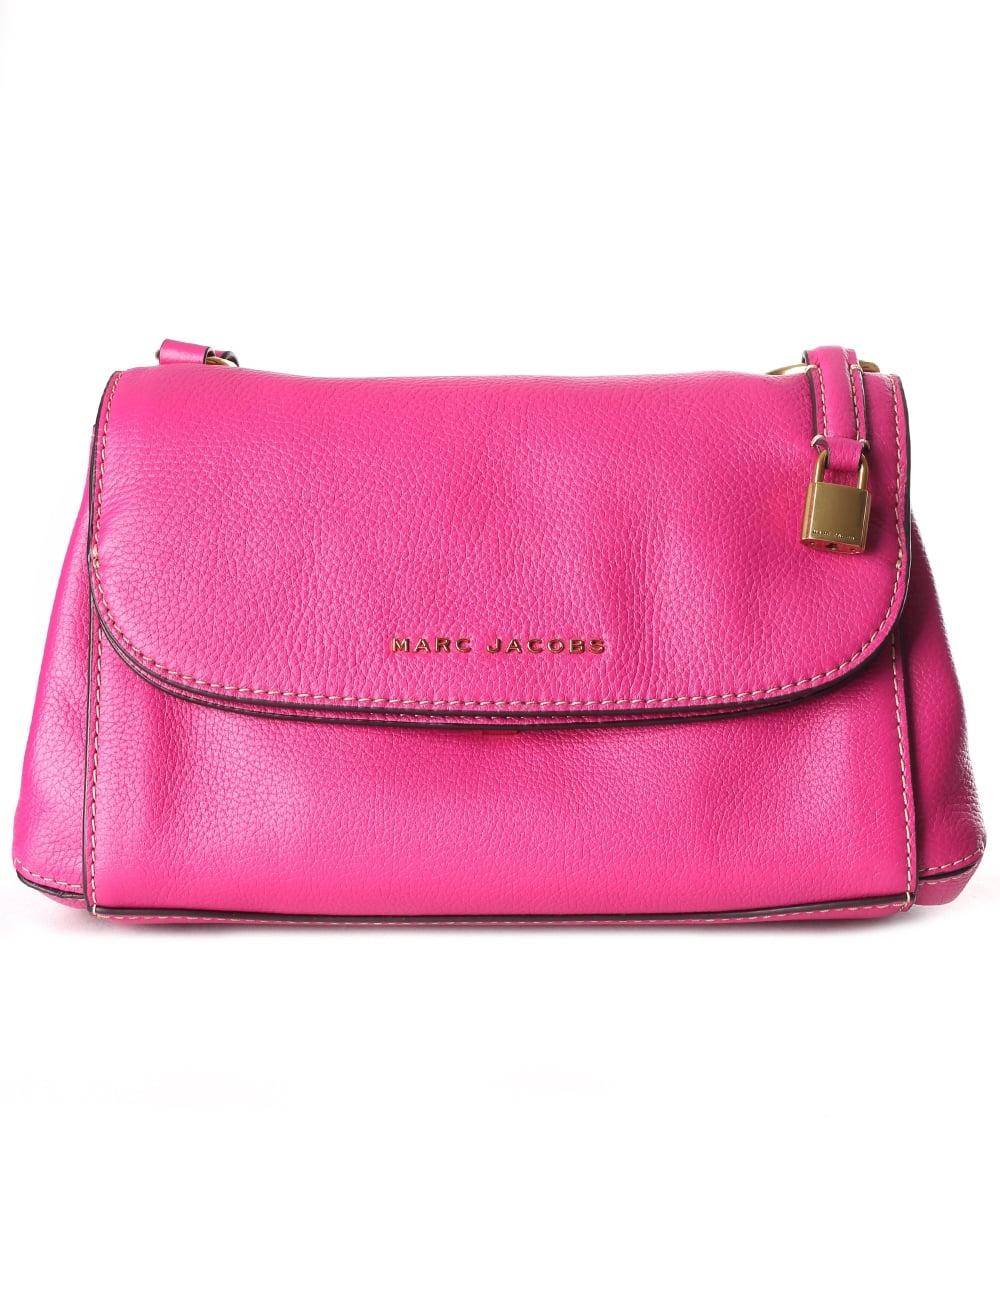 7e7c8f5a36 Marc Jacobs Women's The Boho Gring Crossbody Bag